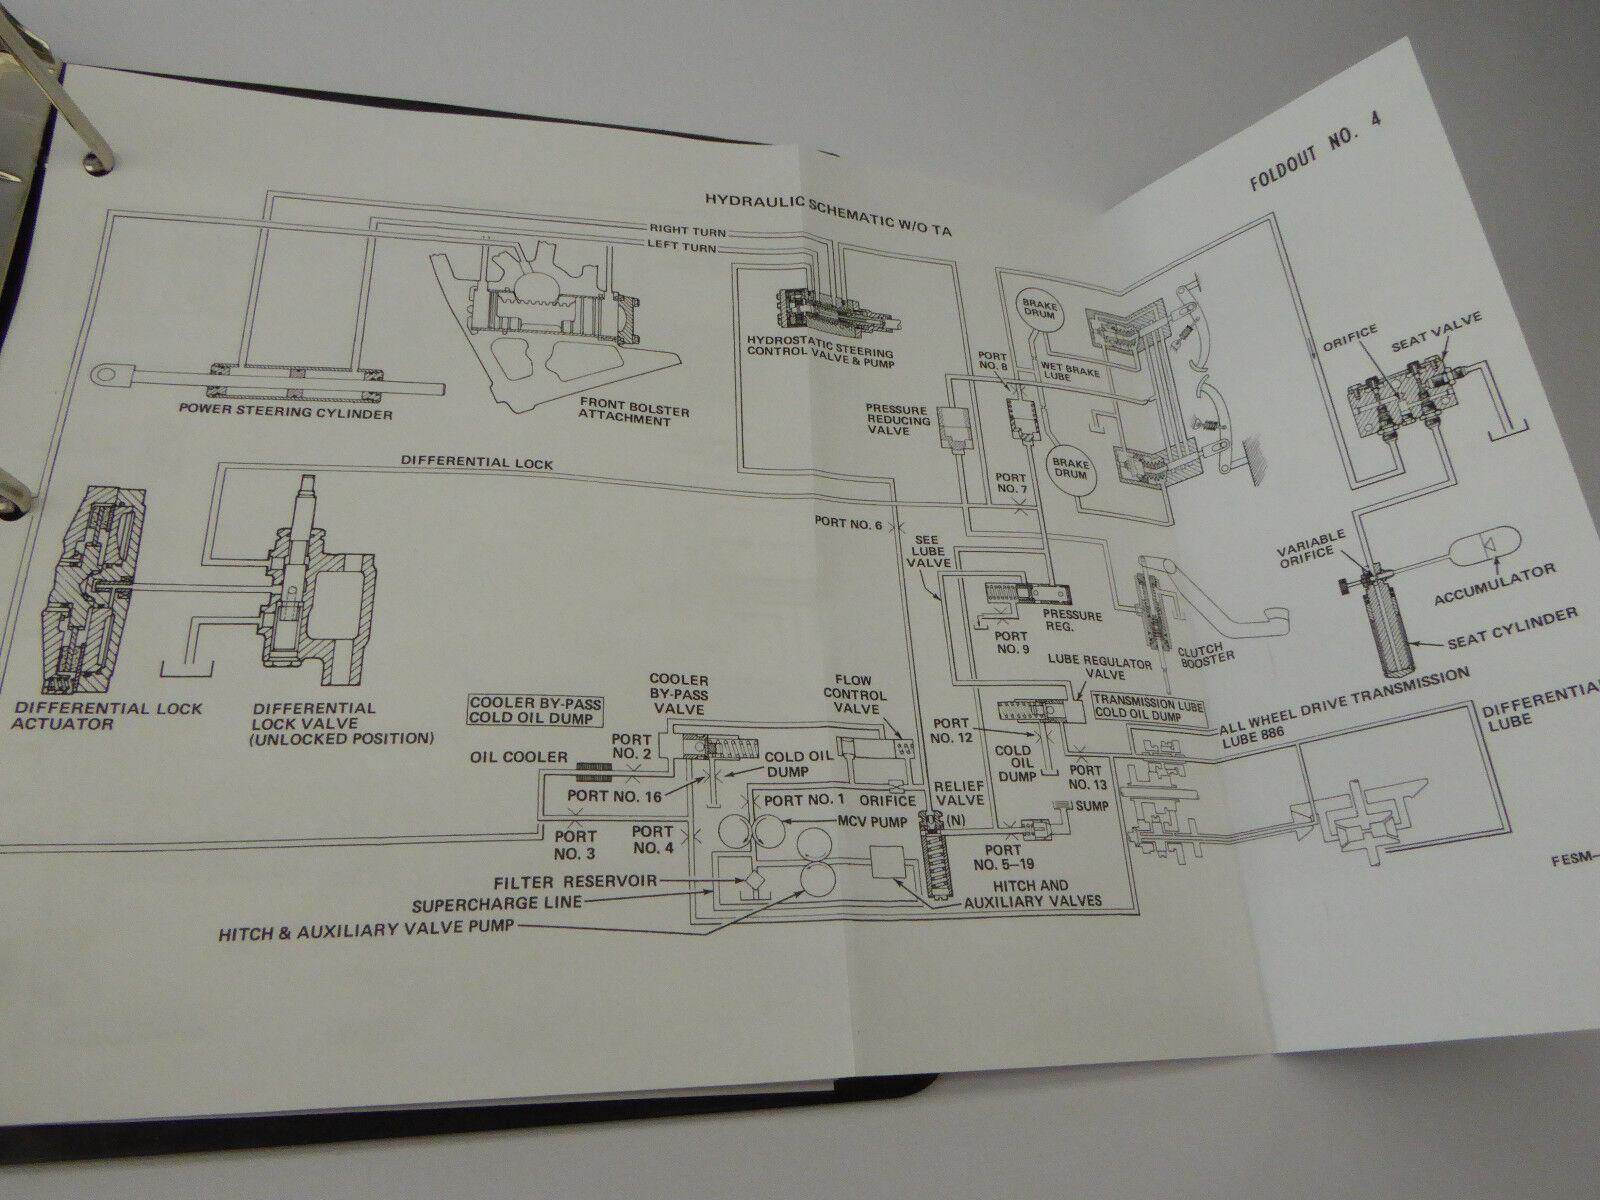 International 1086 Clutch Diagram Detailed Wiring Diagrams Tractor Ih 786 886 986 1486 1586 Hydro 186 Vs 1066